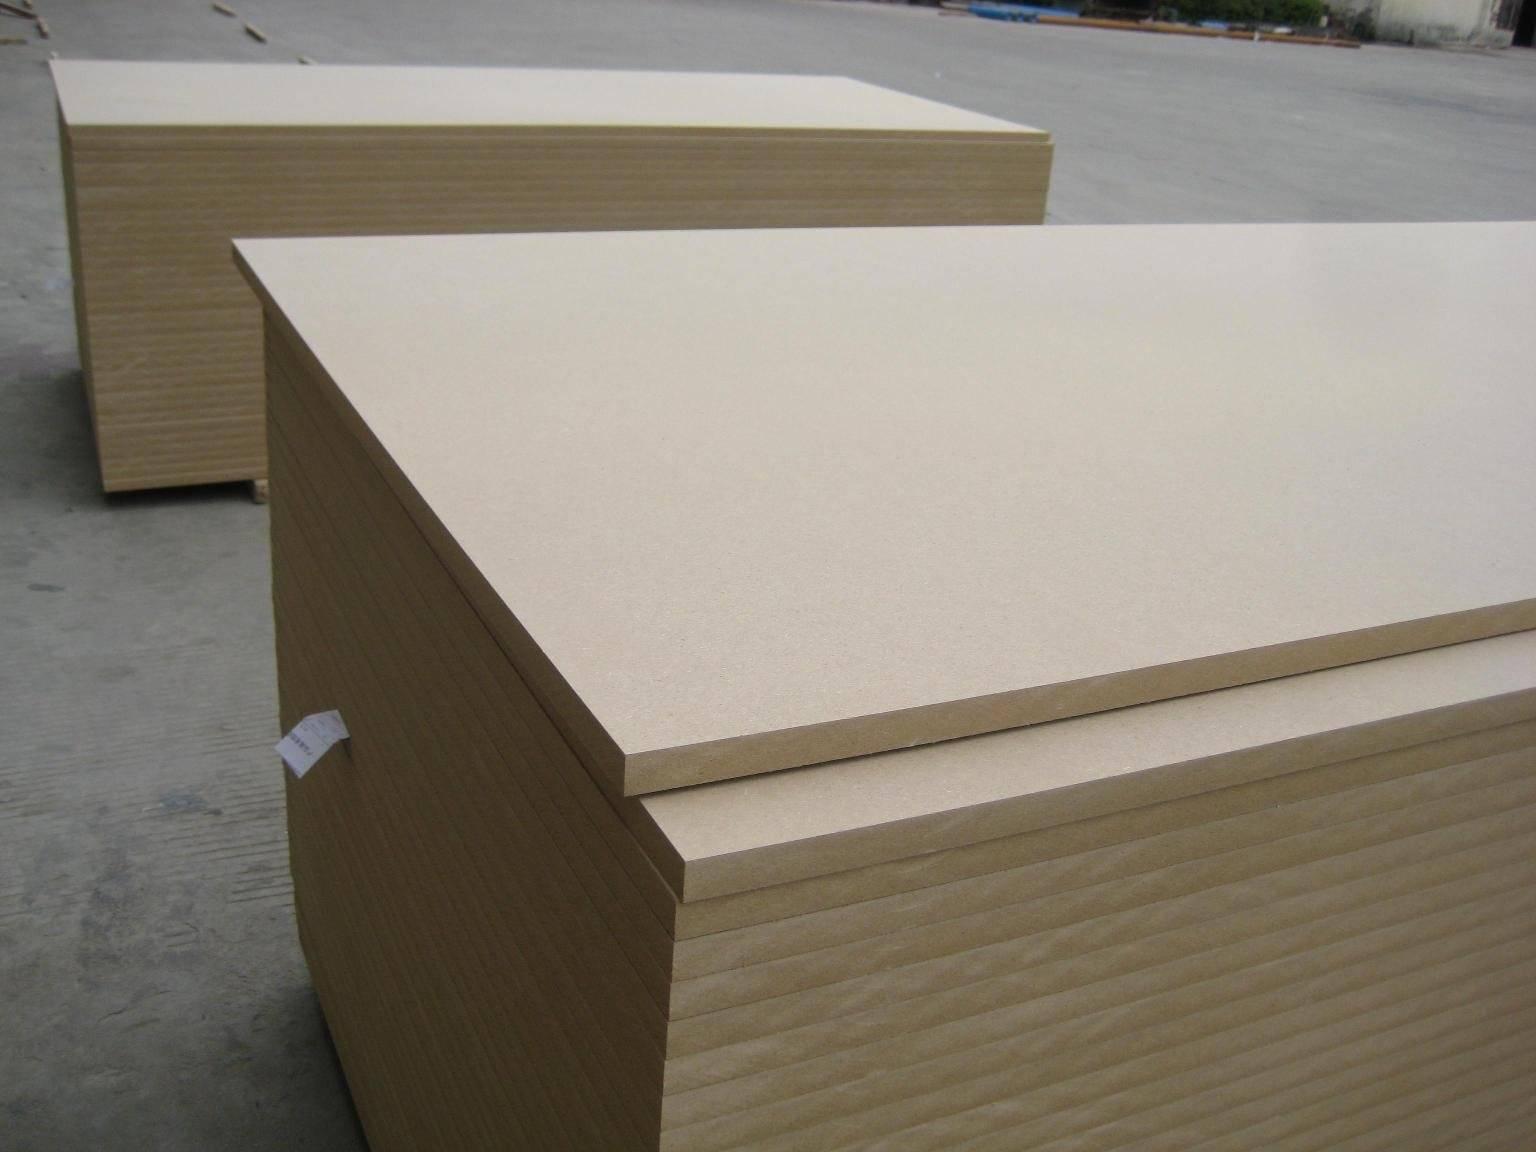 12202440mm size plain MDF raw mdf board Manufacturer